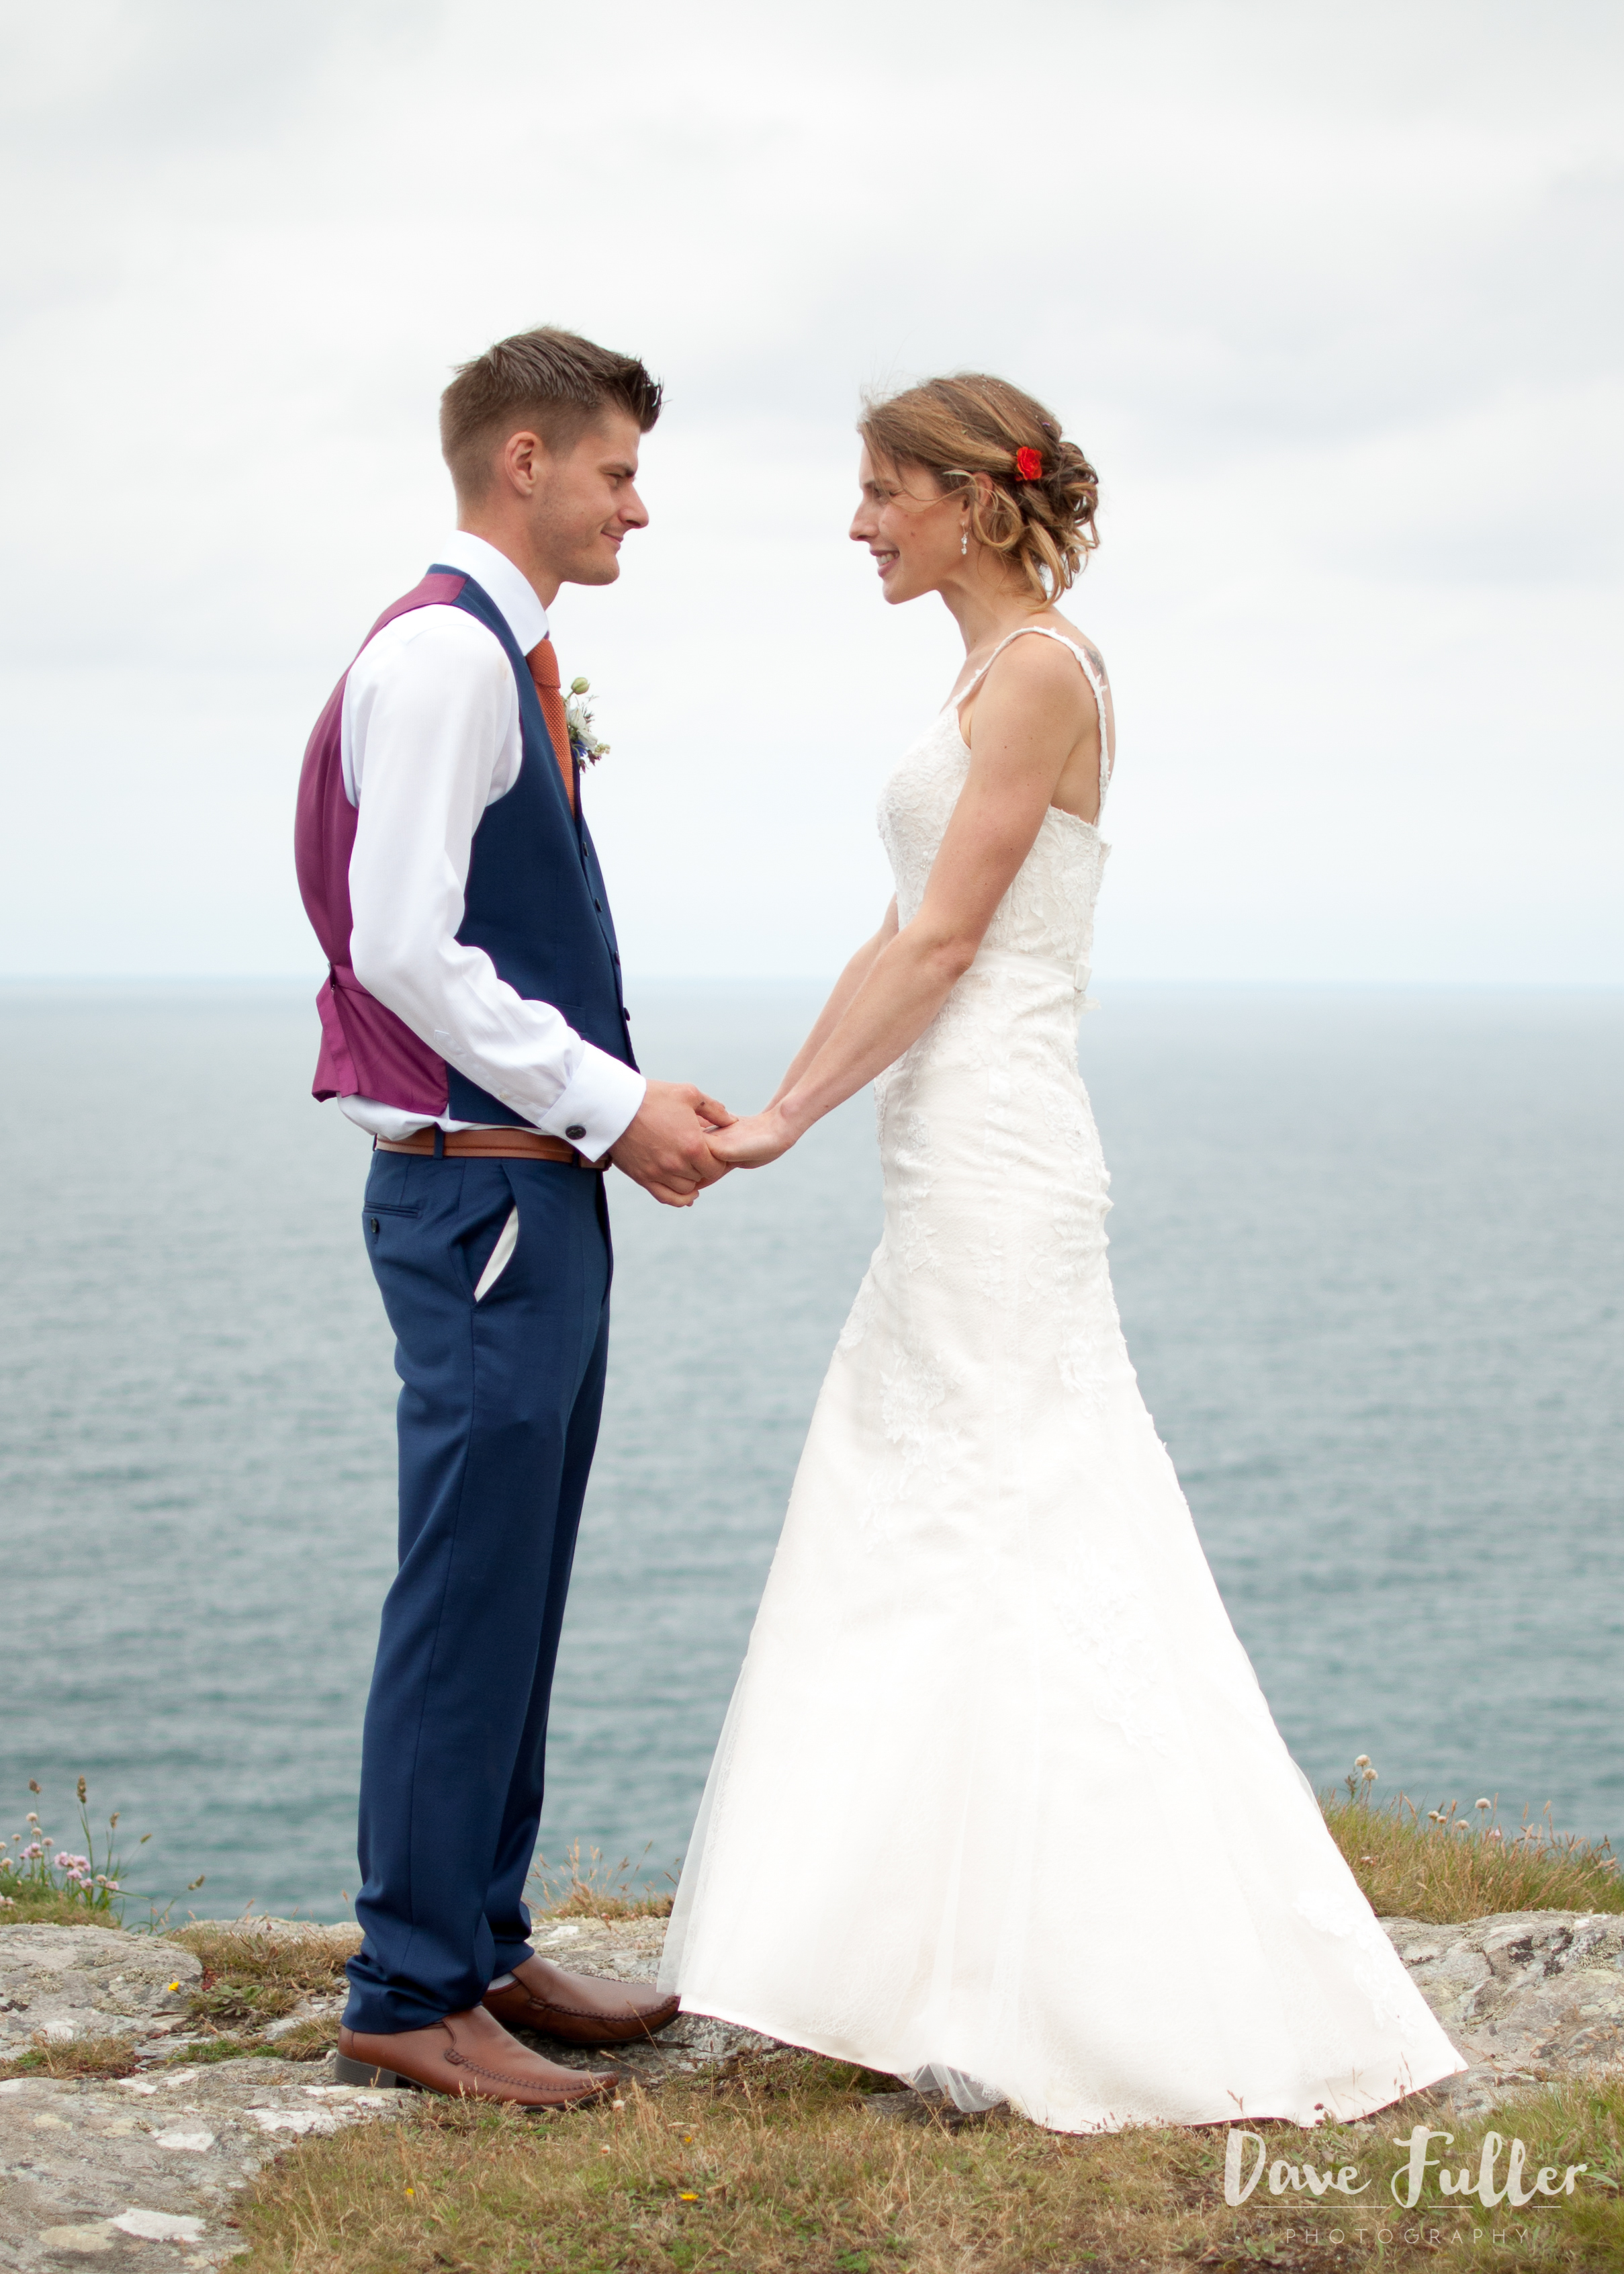 Nottingham Wedding Photographer - ward-0623.jpg